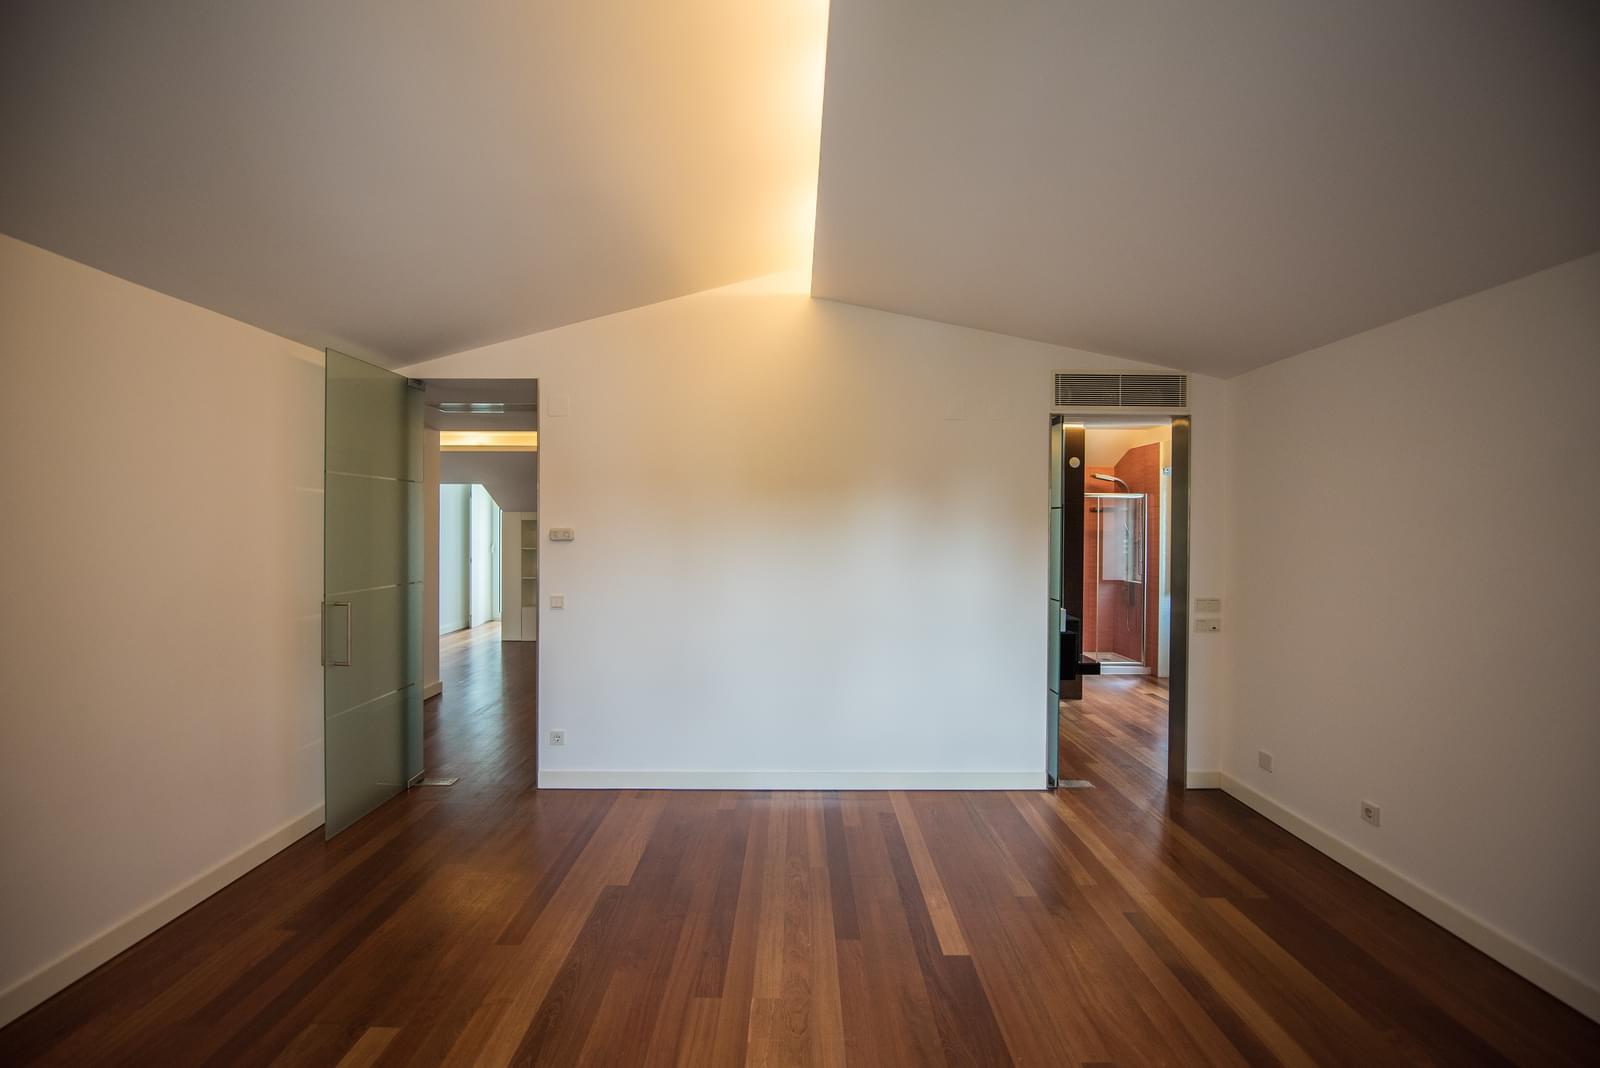 pf19211-apartamento-t4-lisboa-995a4f81-7515-429a-a8ac-a5890b2f6ce2